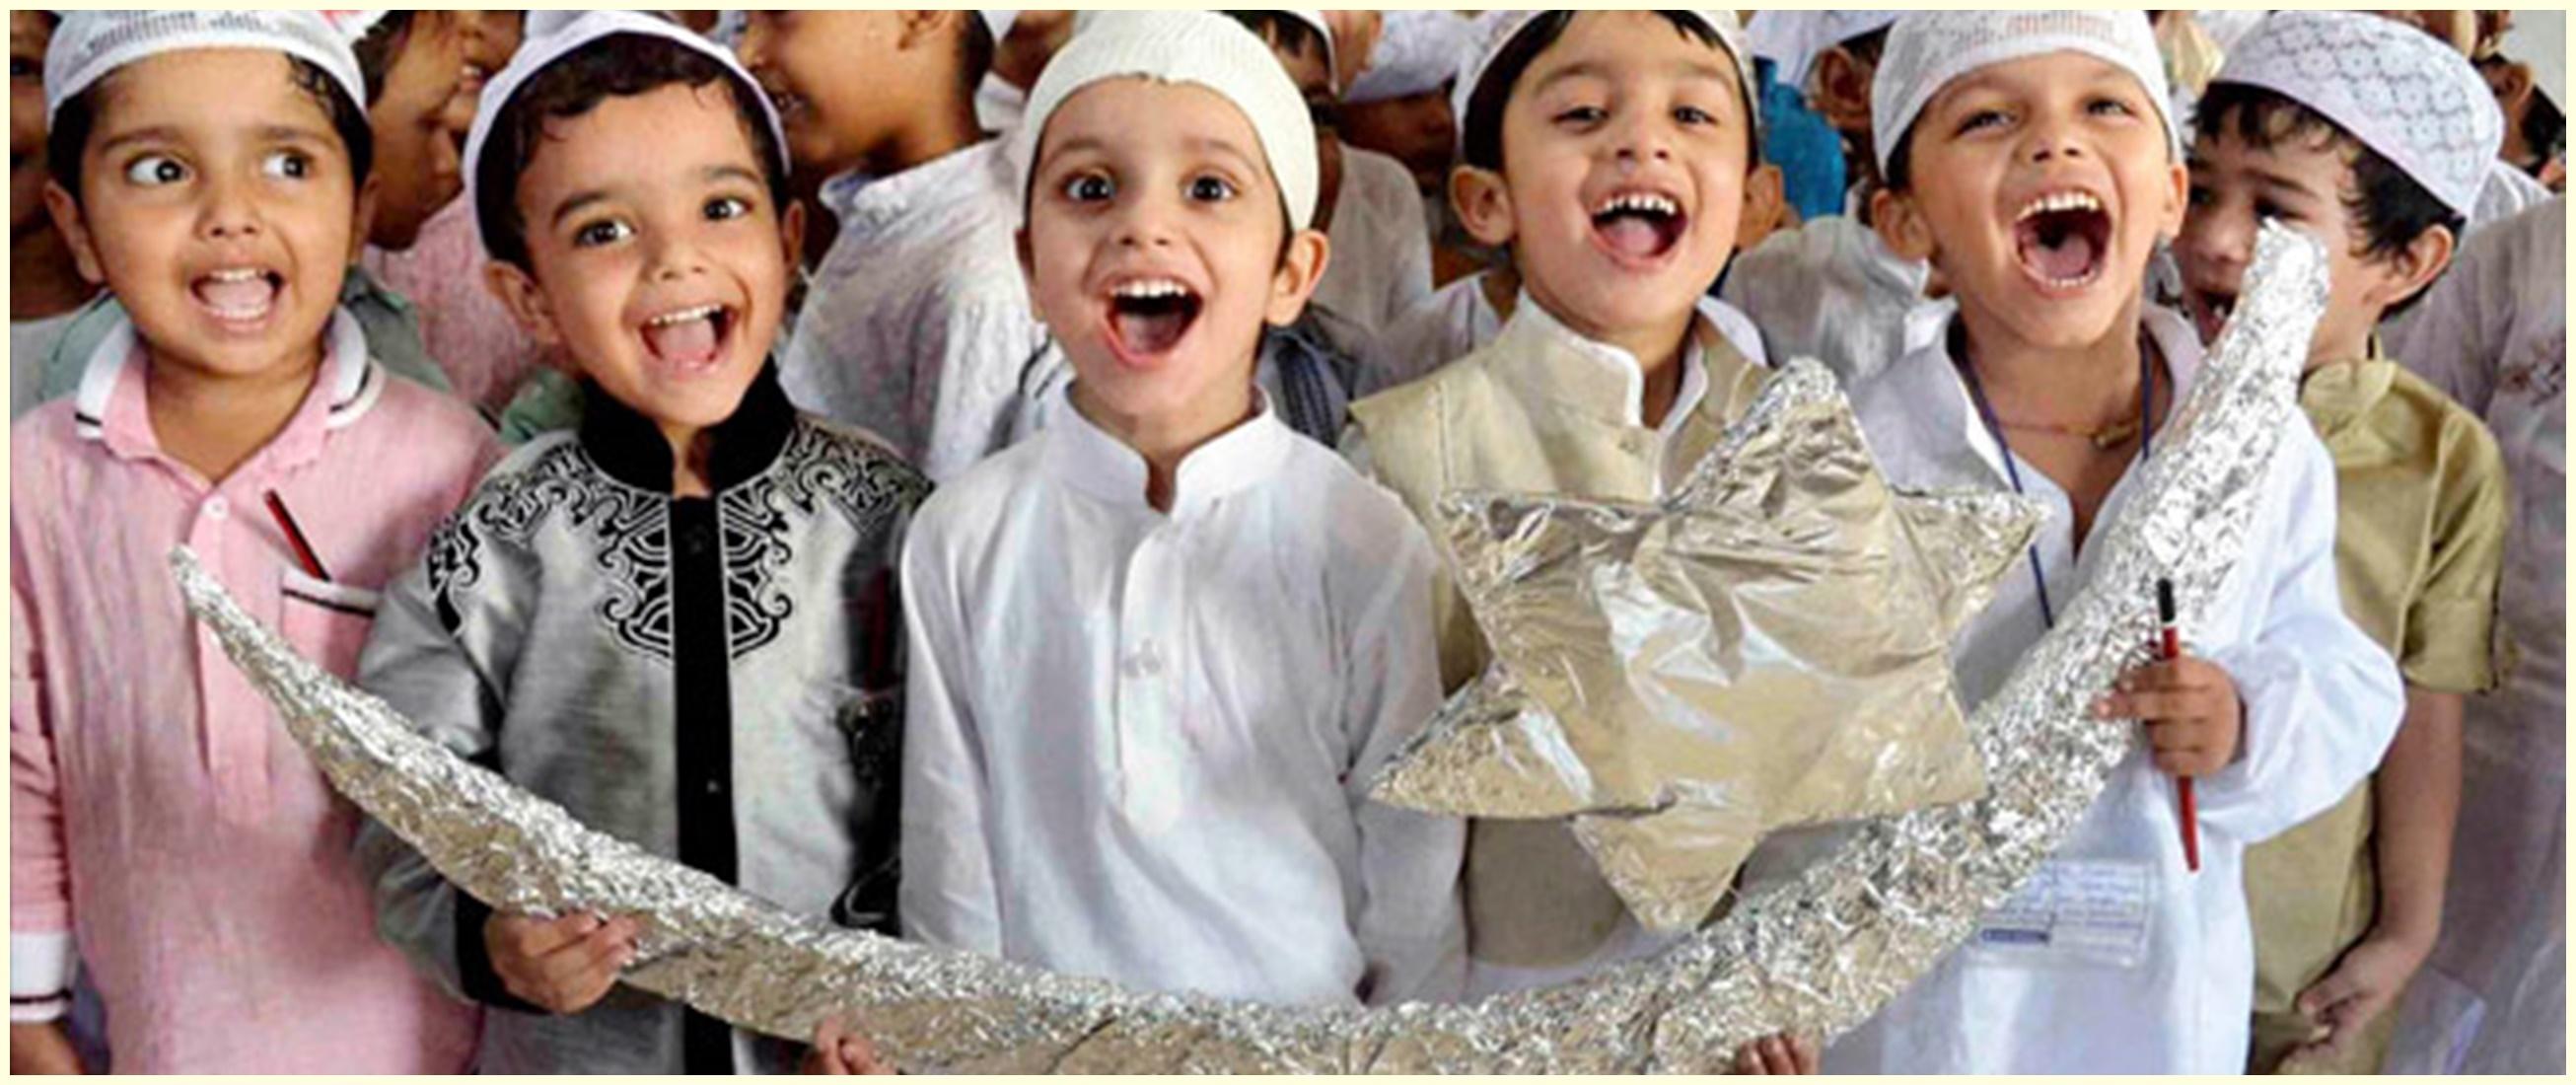 40 Ucapan selamat Idul Fitri bahasa Inggris & Indonesia, penuh makna